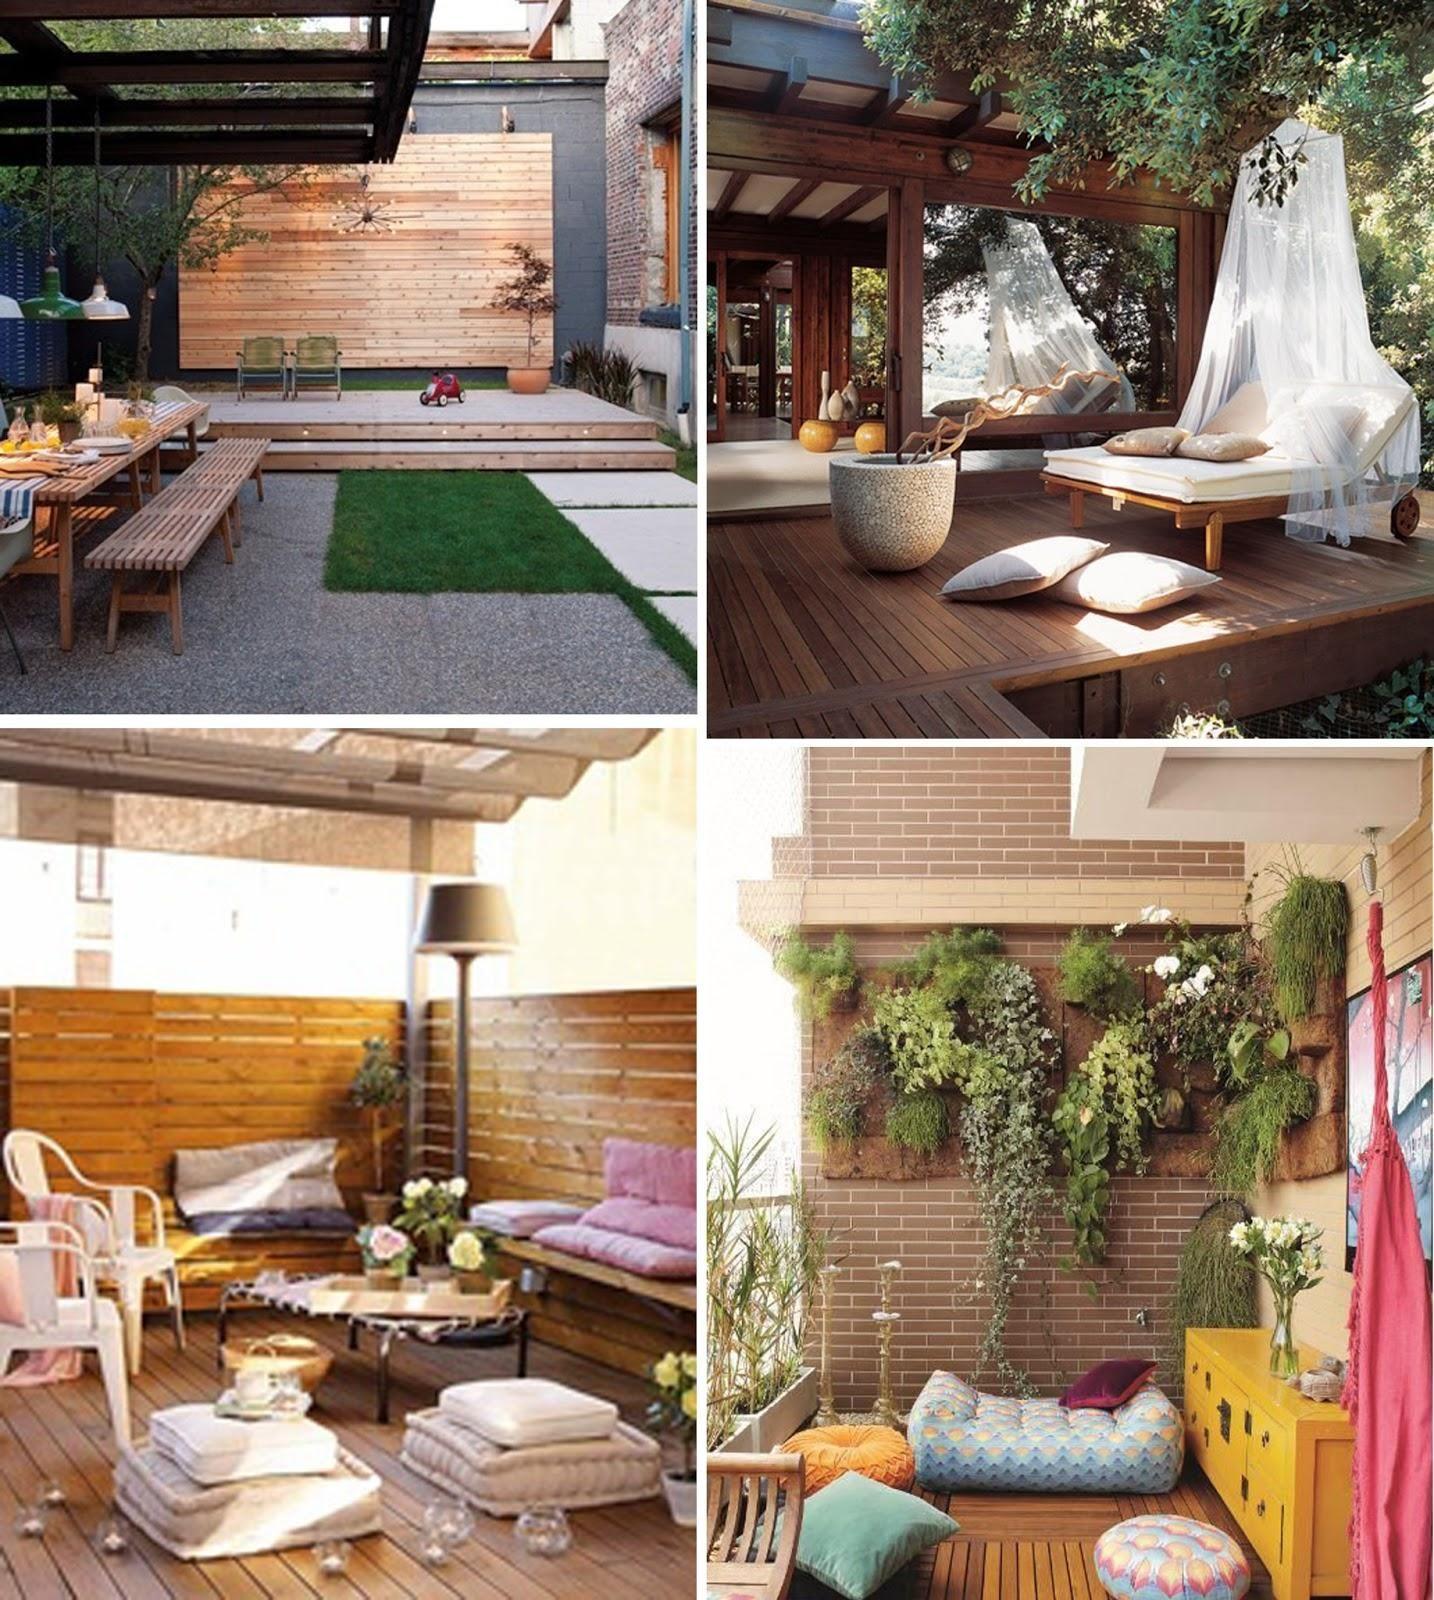 Dise o exteriores buscar con google jardin terrazas for Diseno de fuente de jardin al aire libre